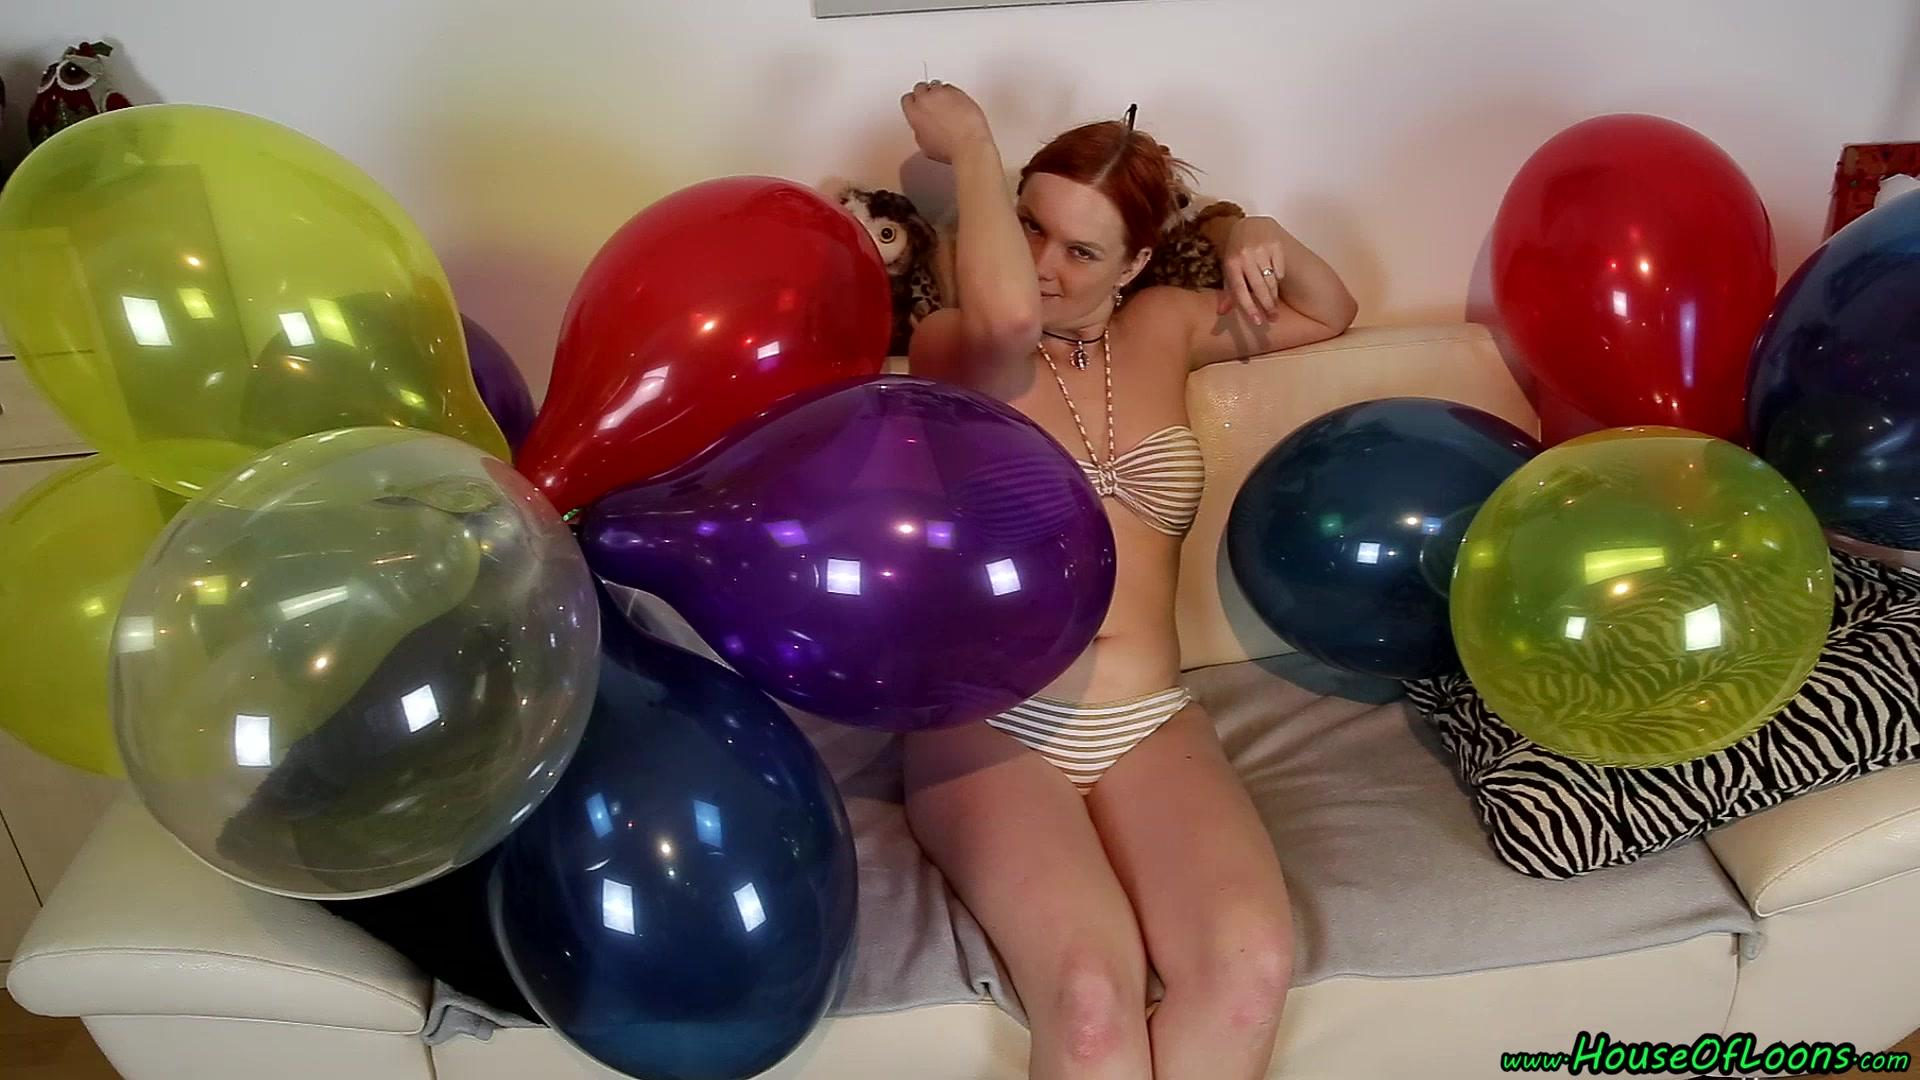 clipspool.com   bikini pinpop cluster balloons